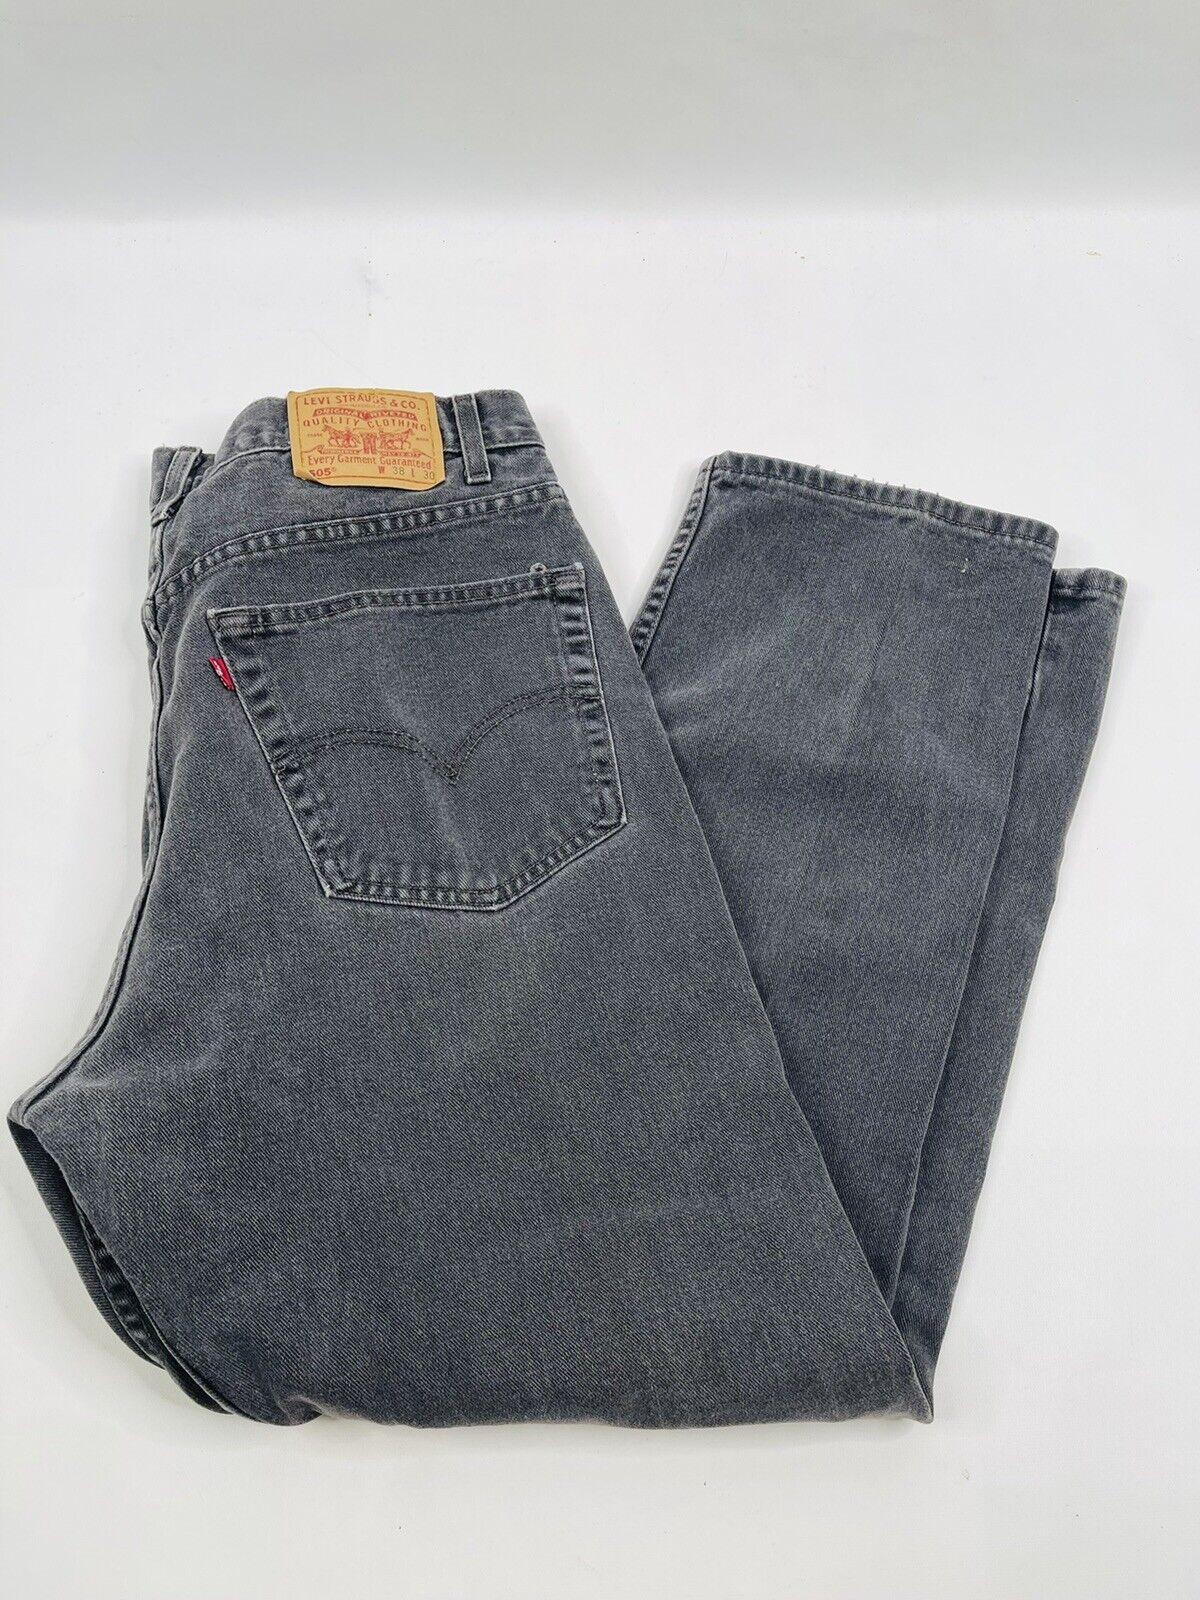 Vintage 90s Levis 505 Regular Fit Straight Leg Fa… - image 3